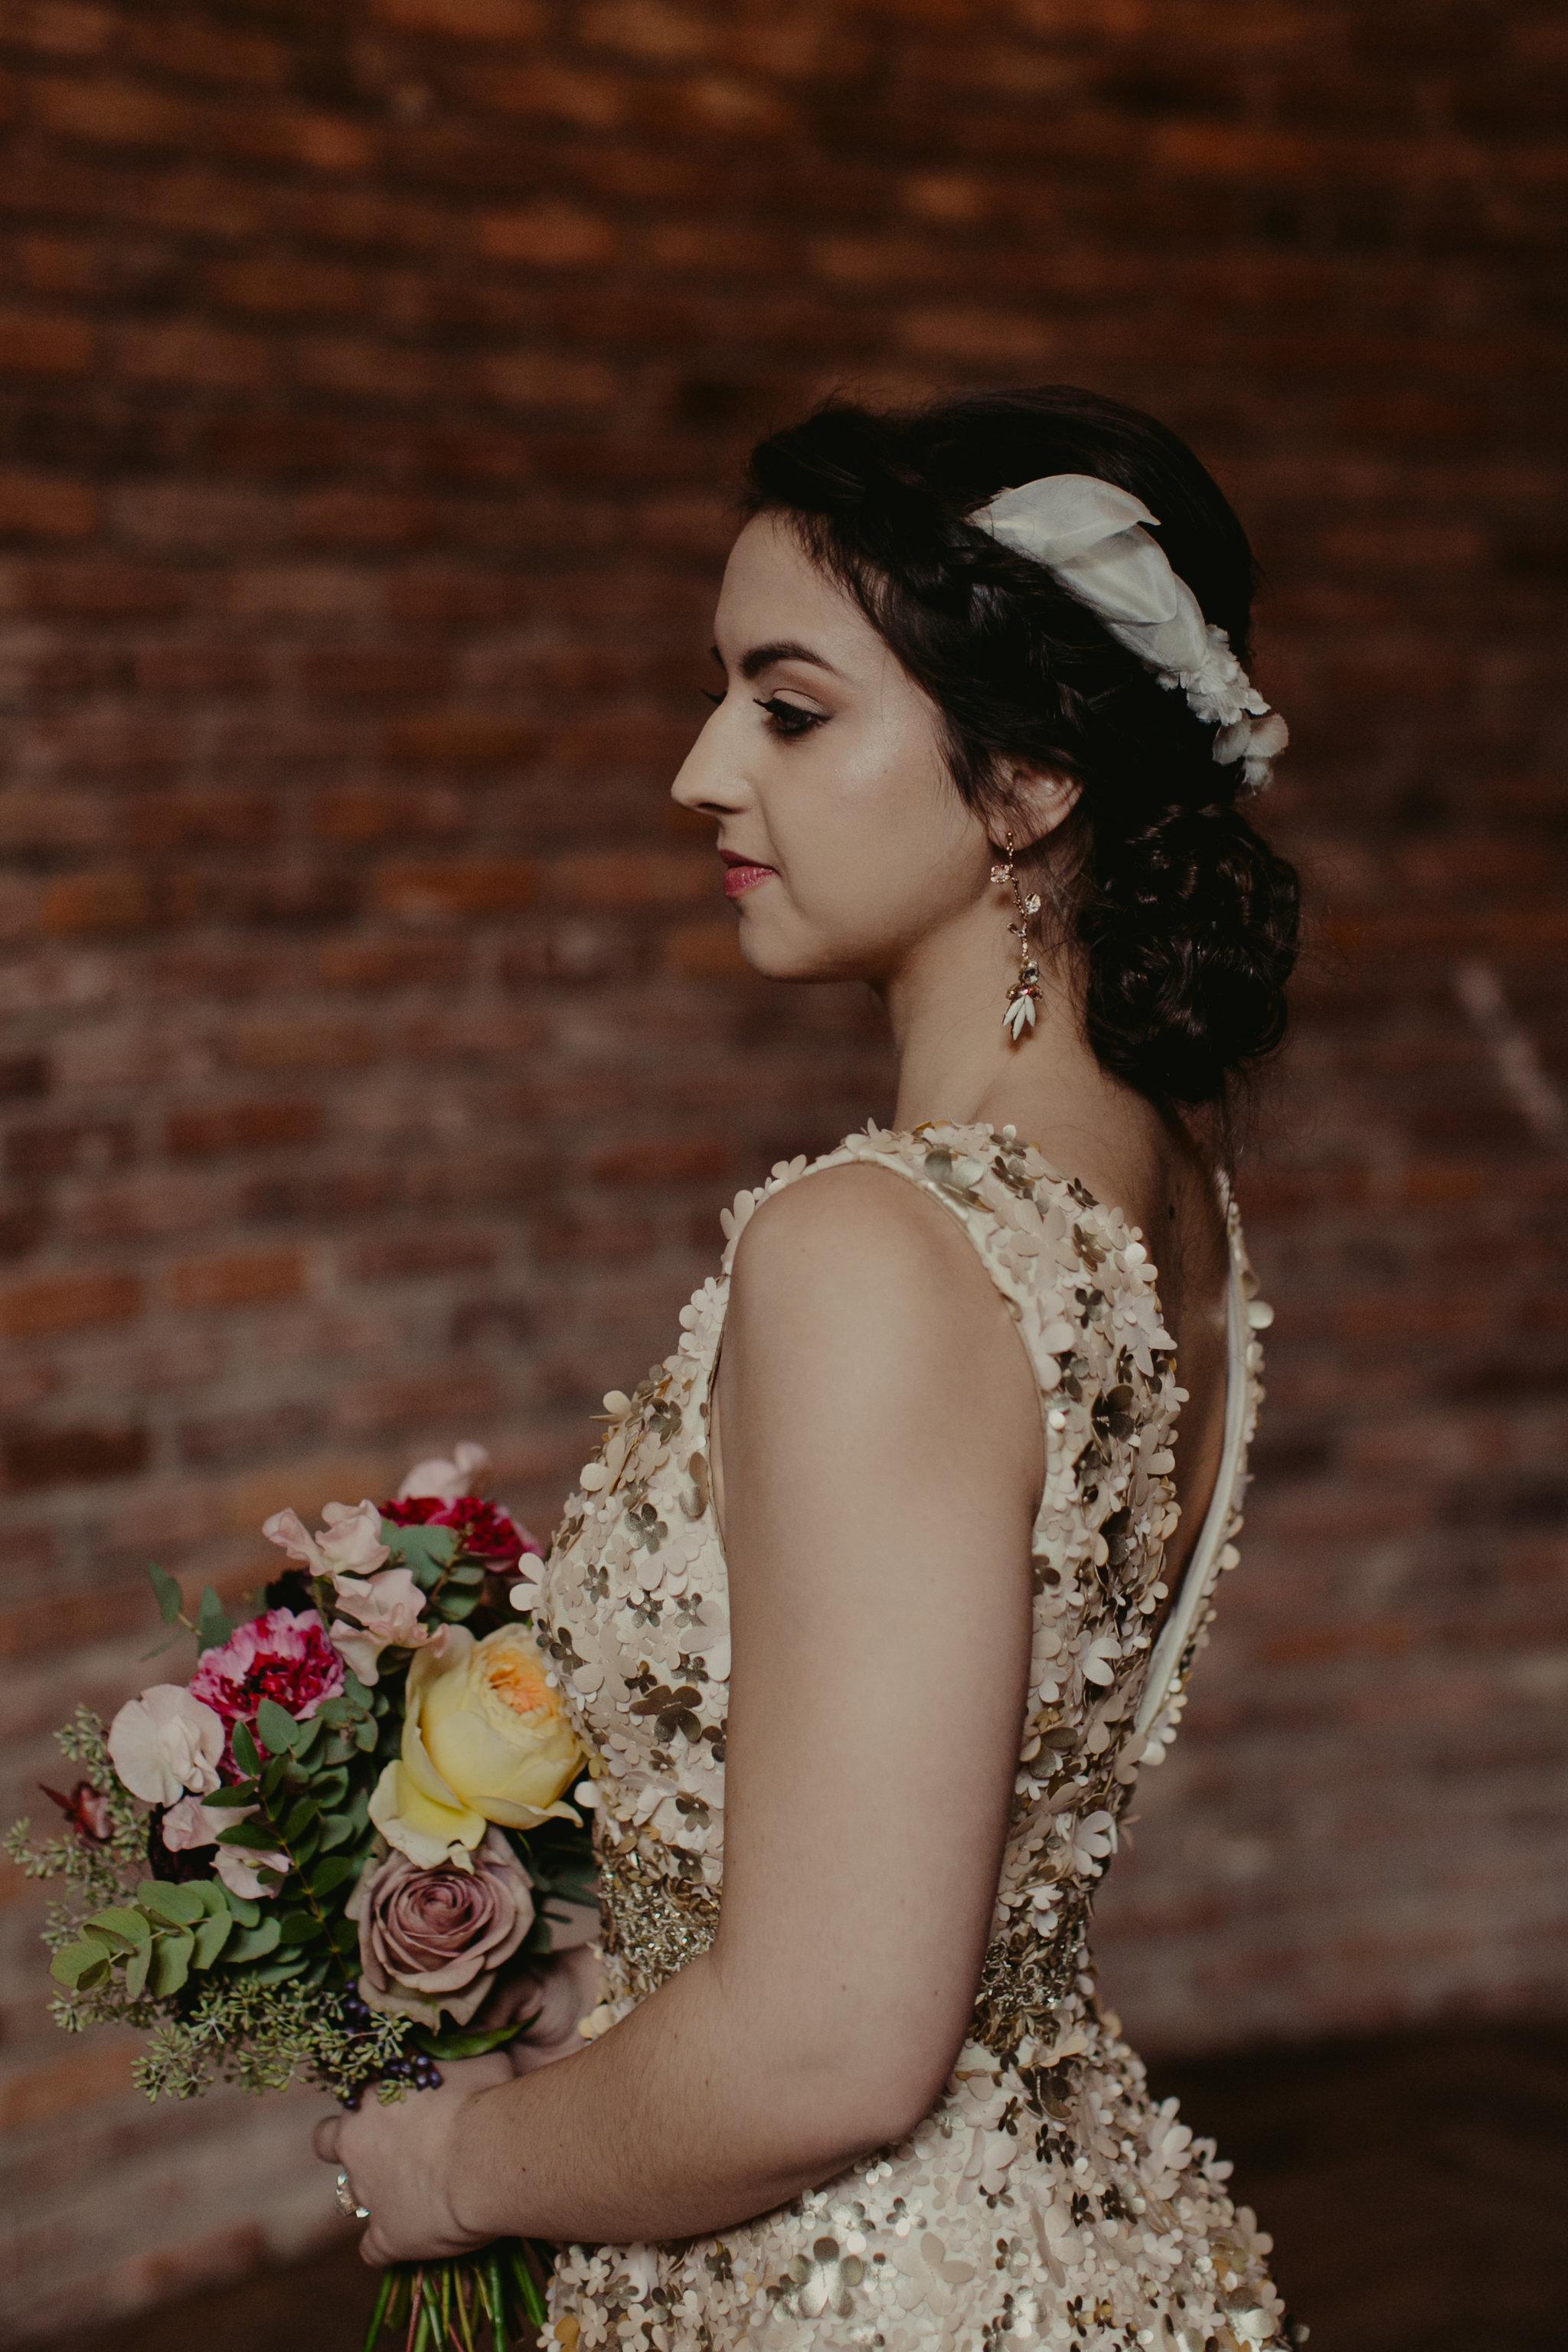 Williamsburg_Hotel_Wedding_Photographer_Chellise_Michael_Photography-148.jpg